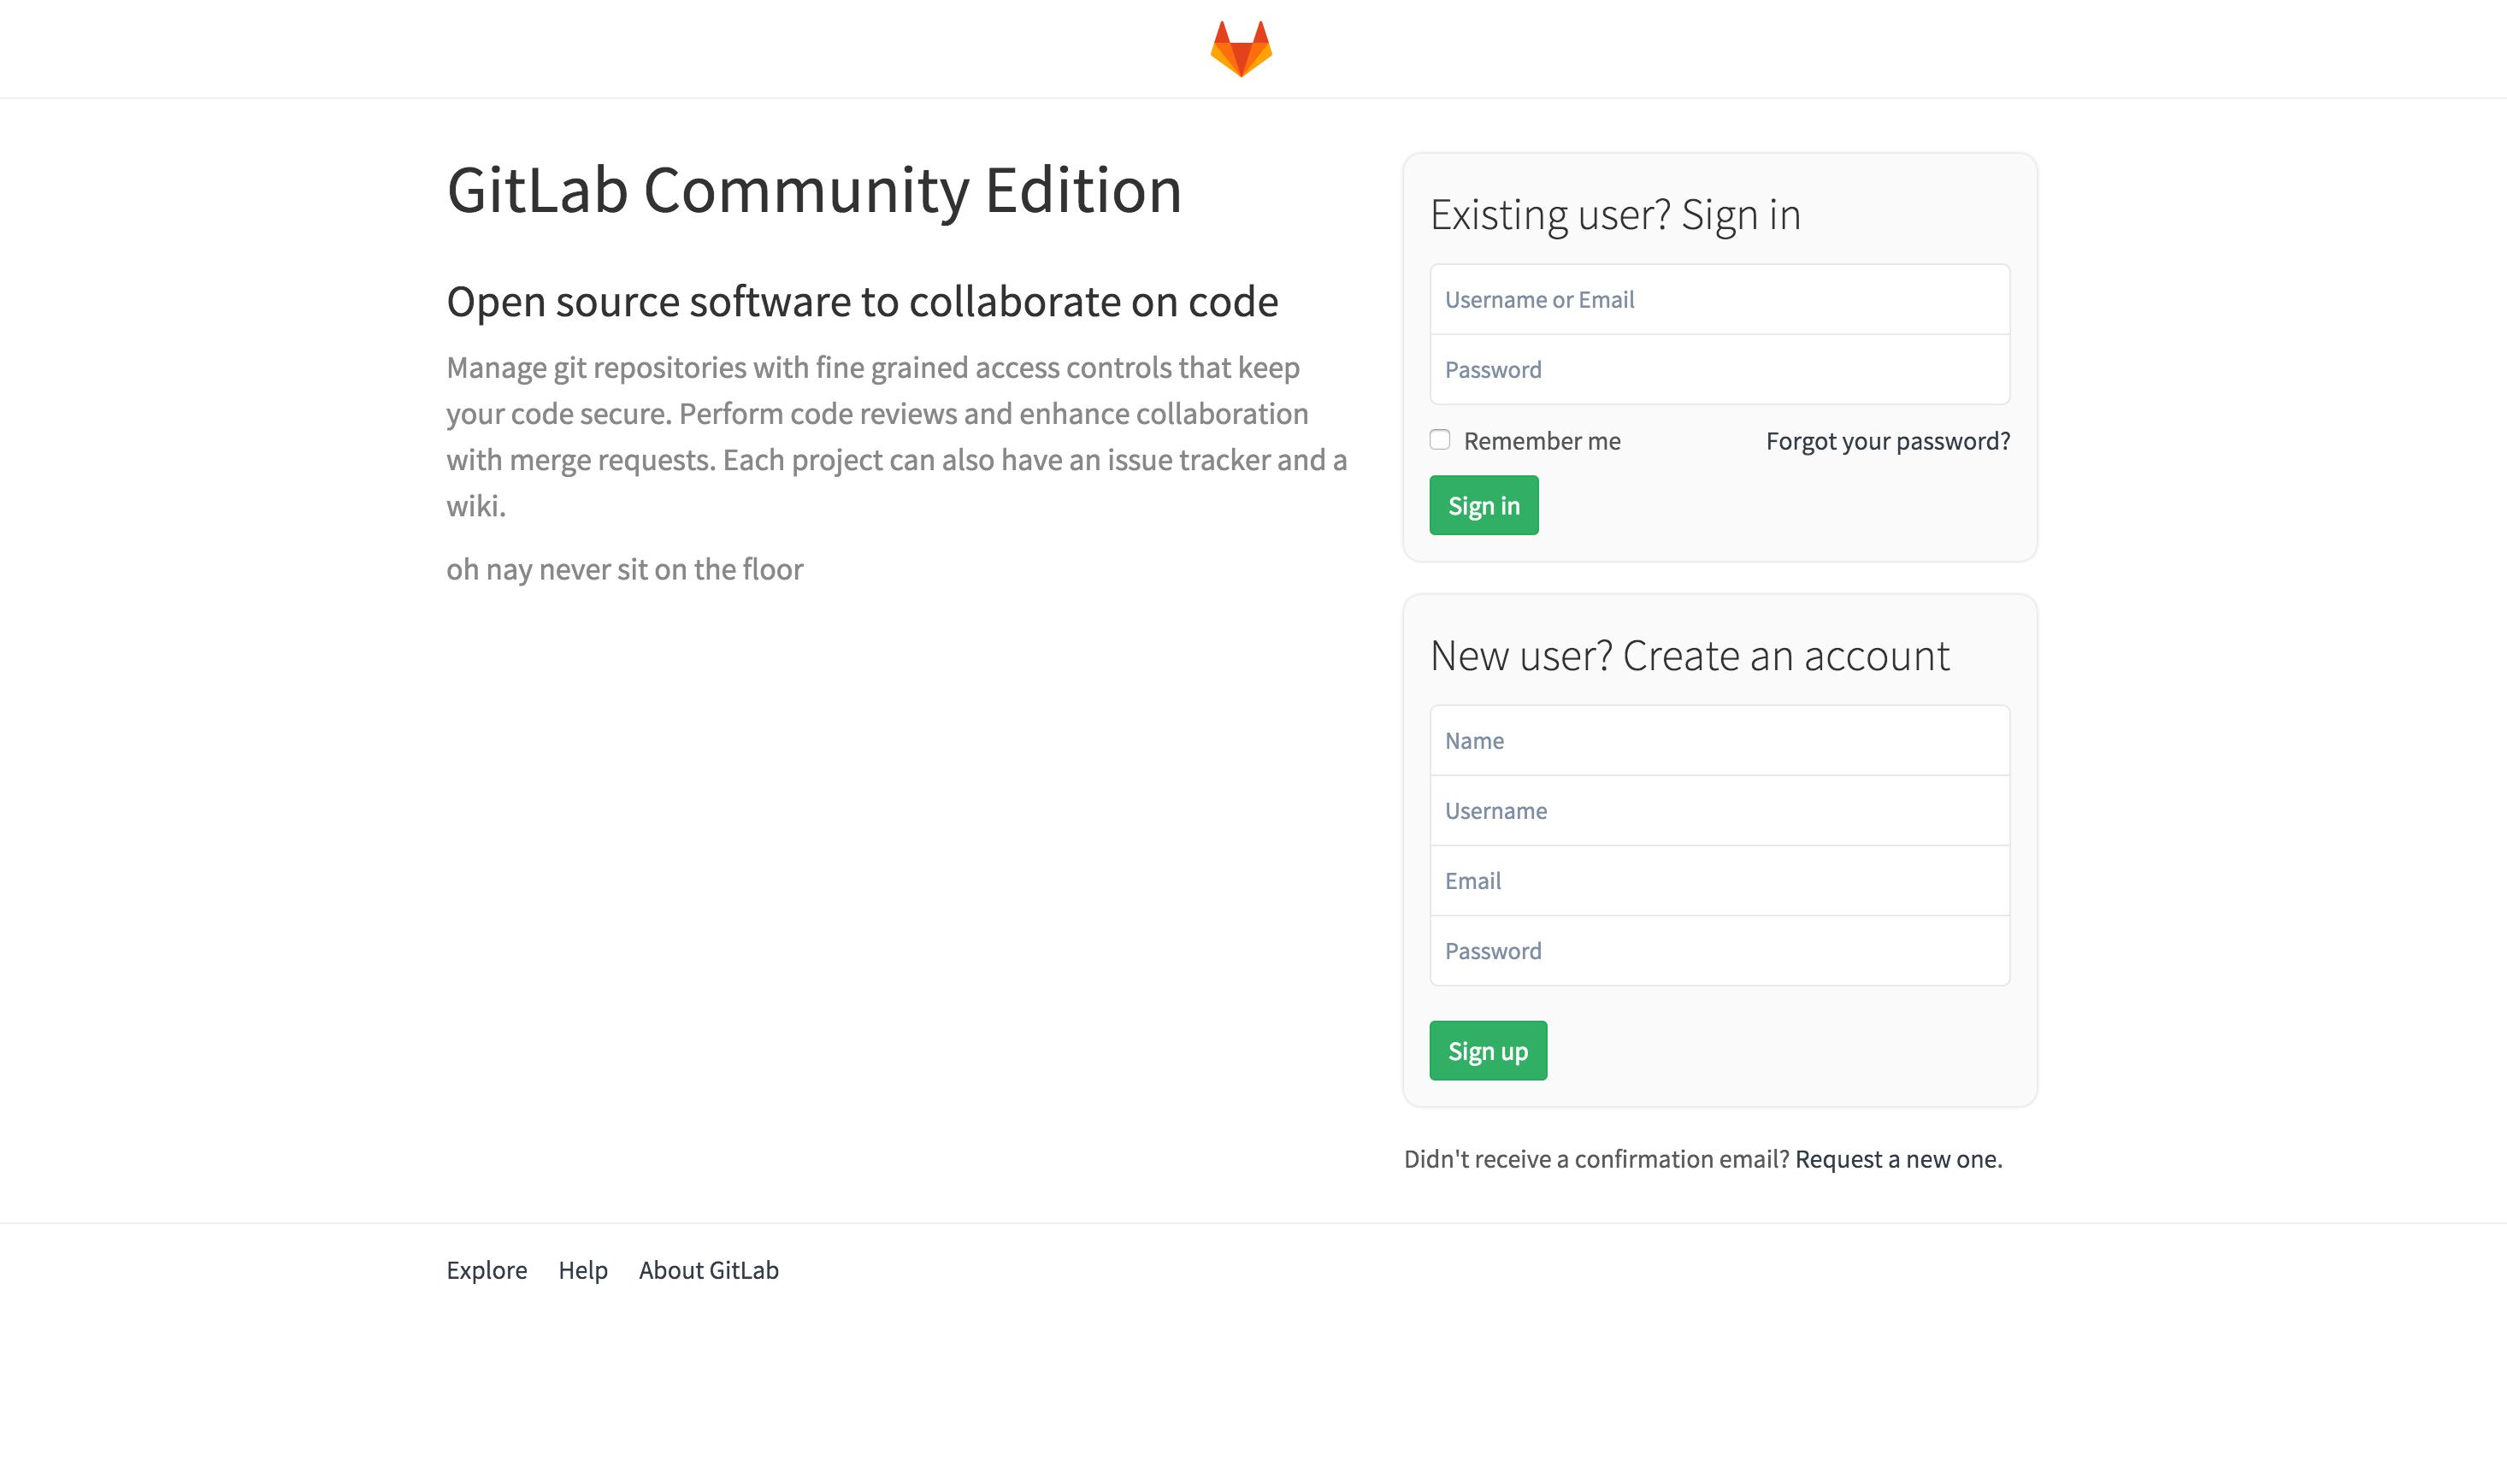 doc/customization/branded_login_page/default_login_page.png